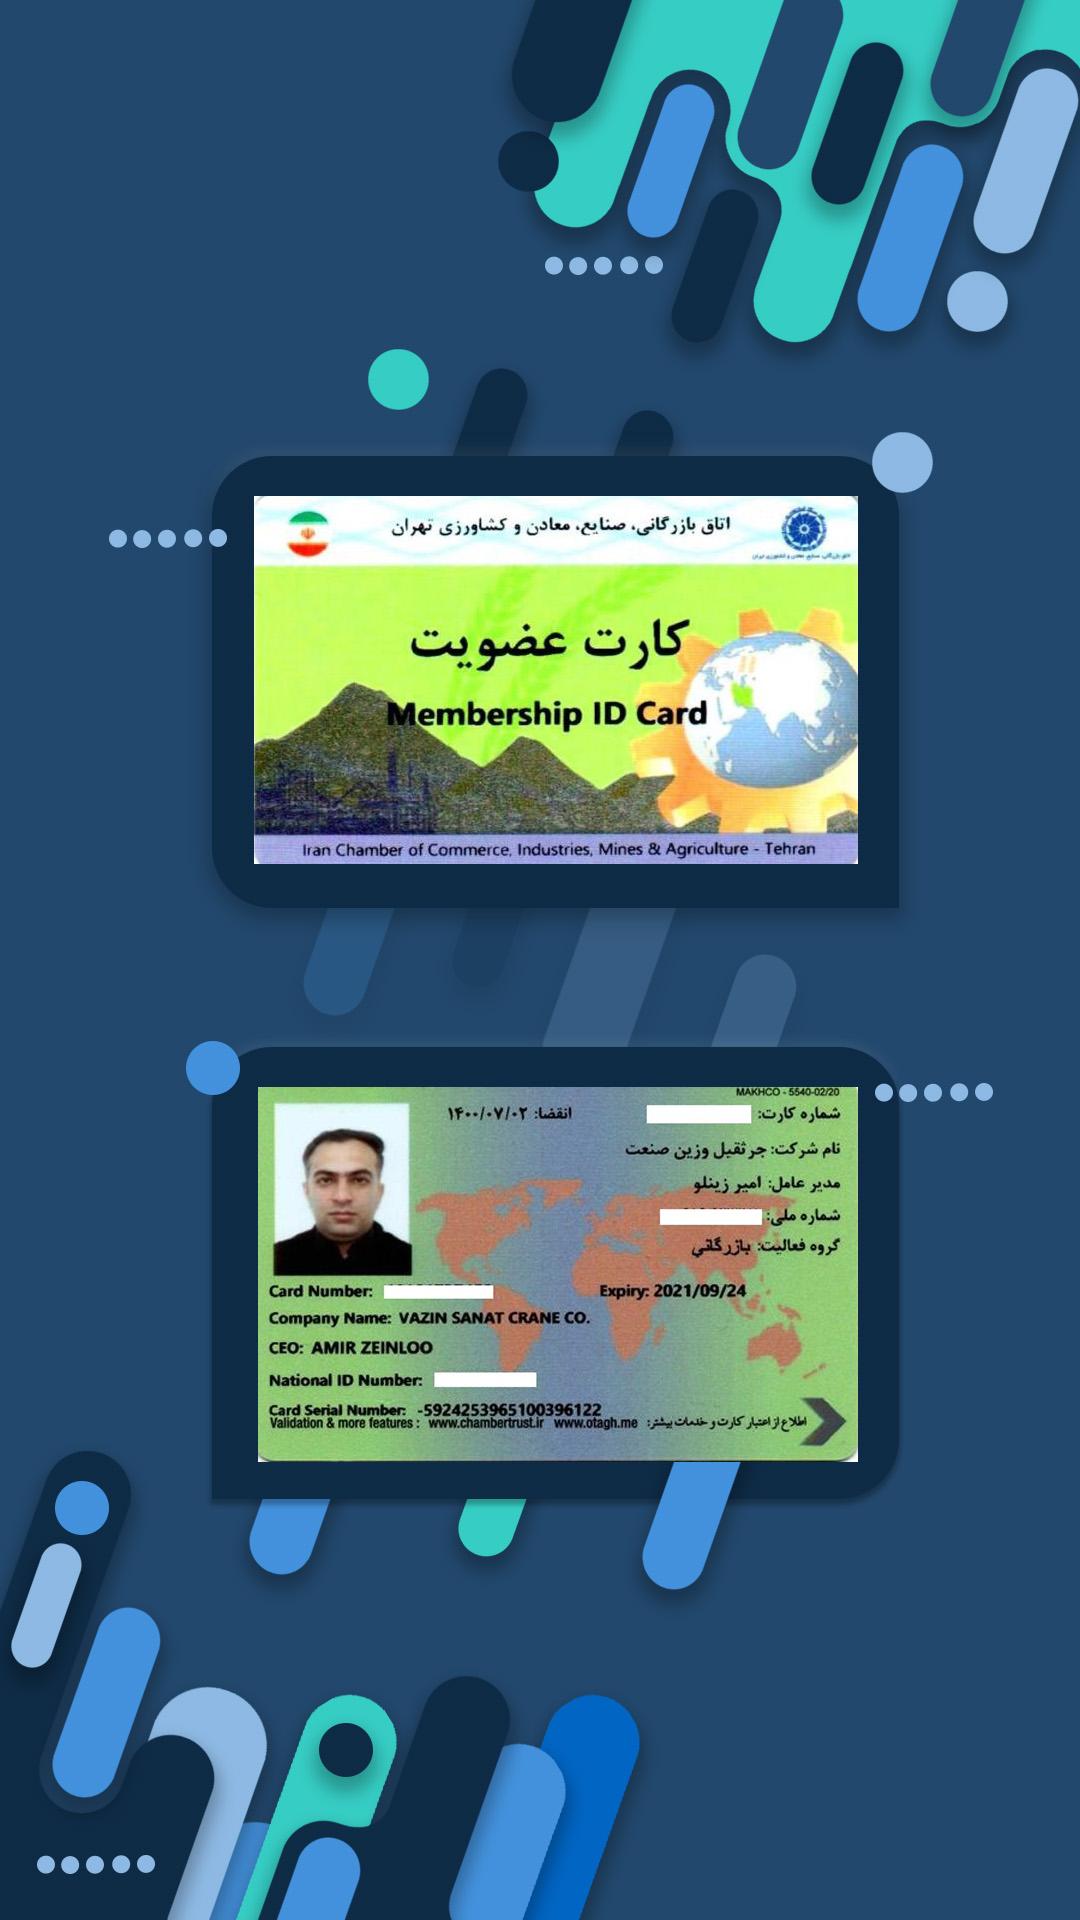 mahan-card-joind-.9-3999